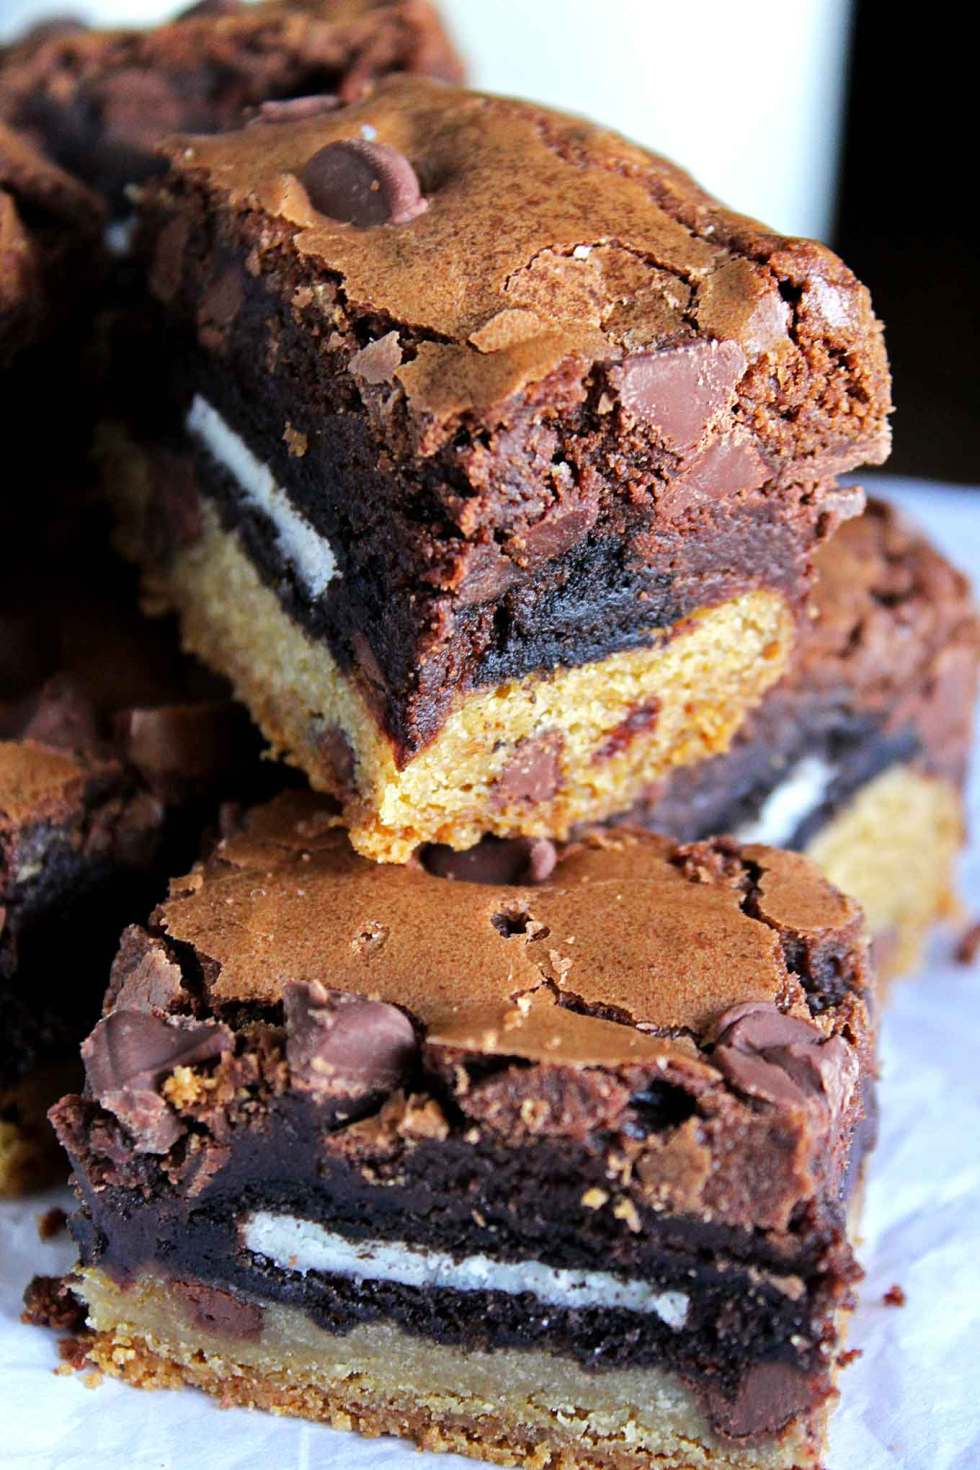 Slutty Brownies | Oreo Brownies | Chocolate Chip Cookie Brownies | Brownies with Oreo and Chocolate Chip Cookies | Easy Brownies | Very Best Brownies